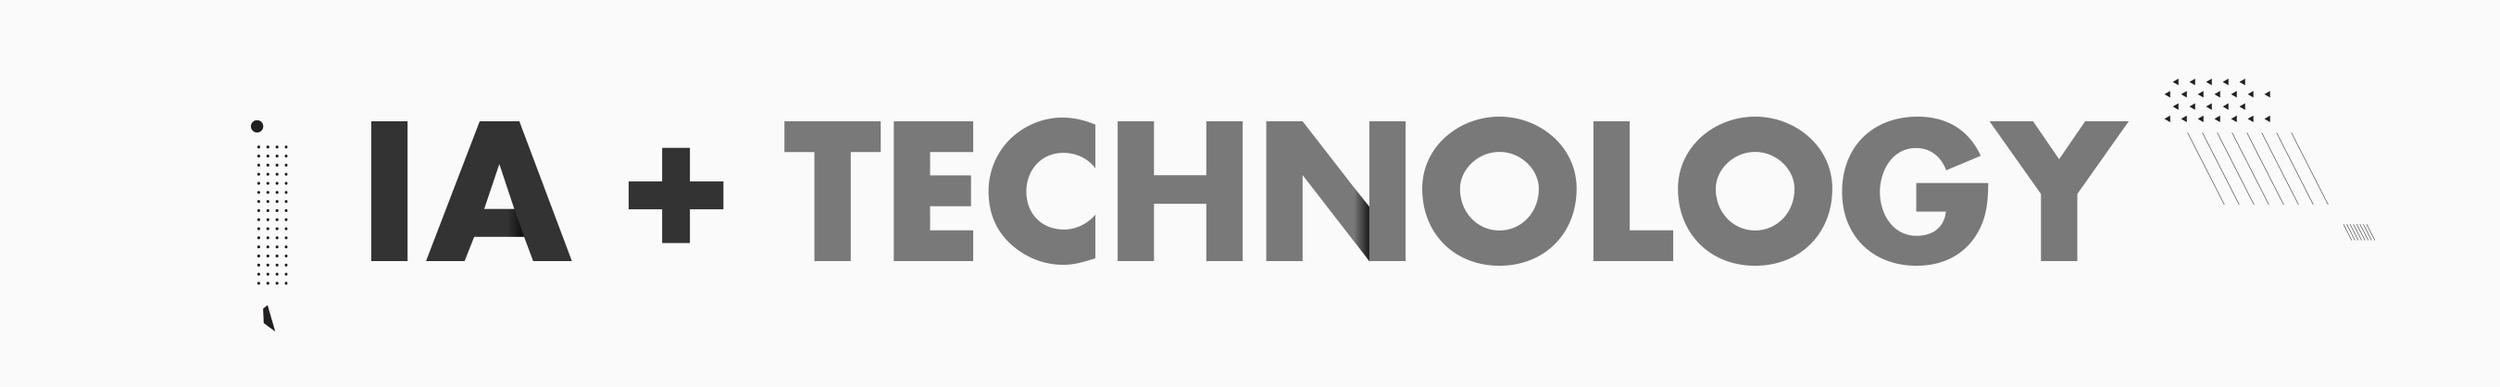 iaTech_Banner.png